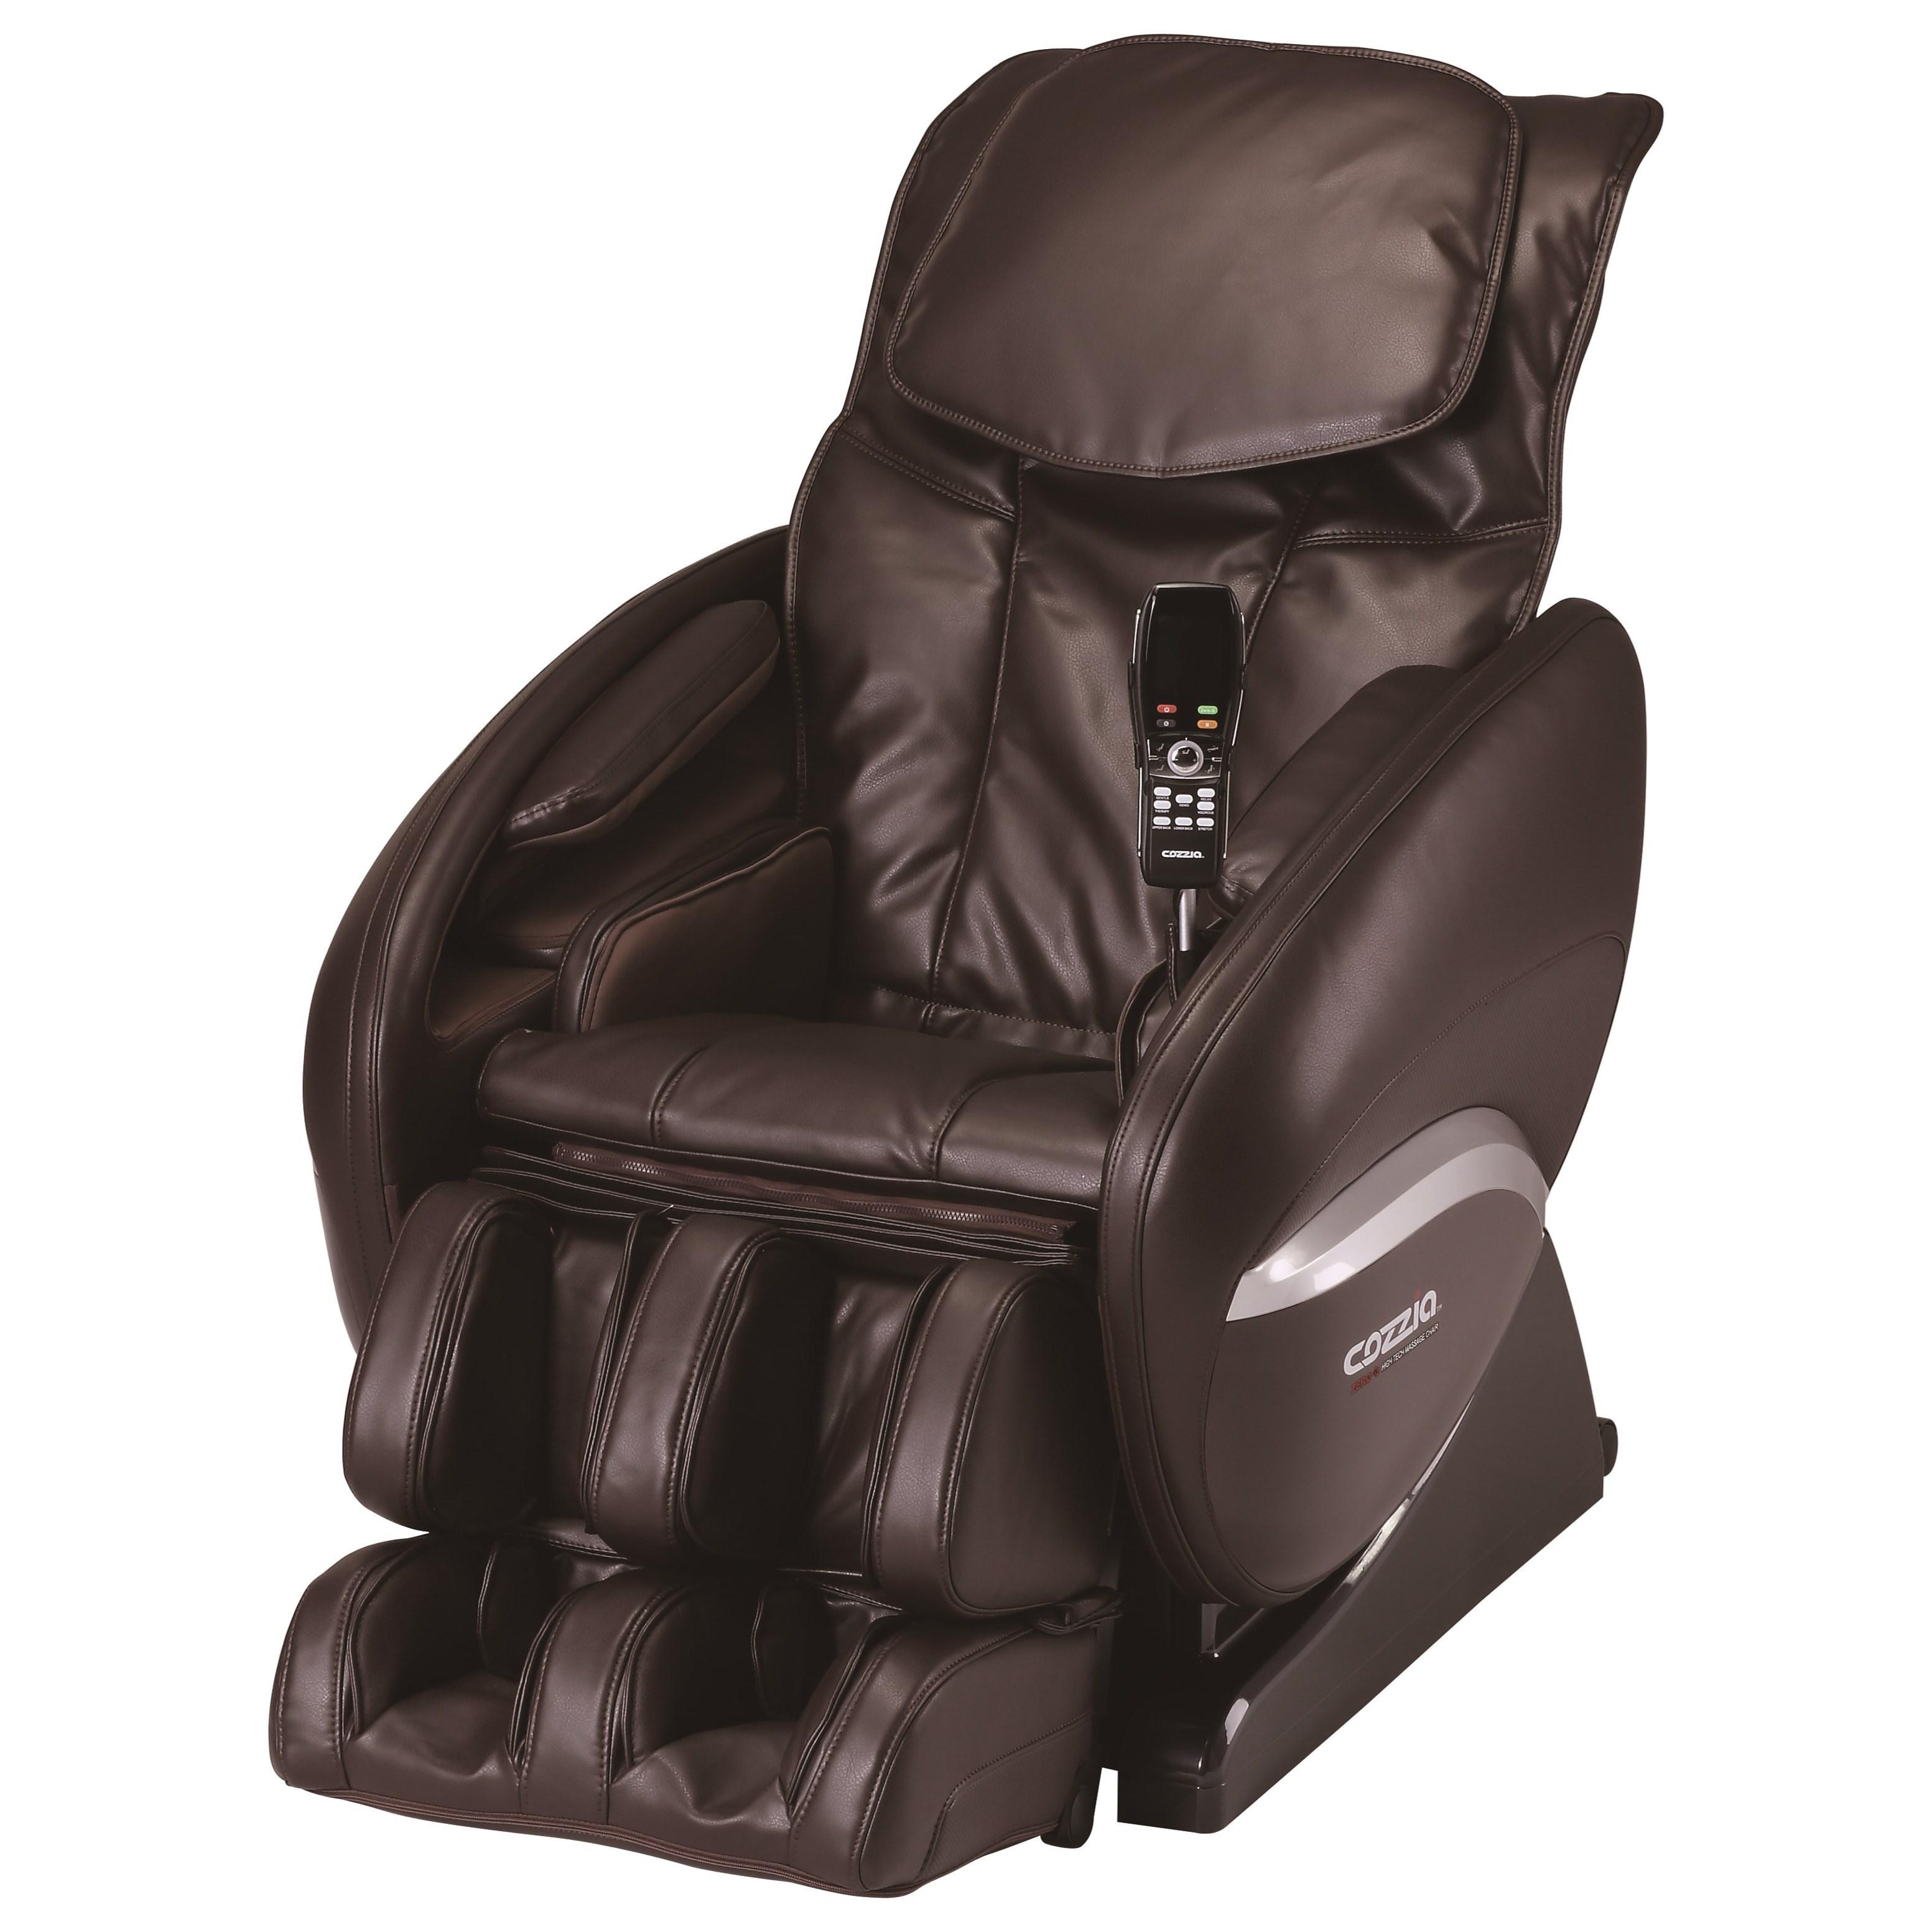 Reclining Massage Chair cozzia cz zero gravity reclining massage chair - hudson's